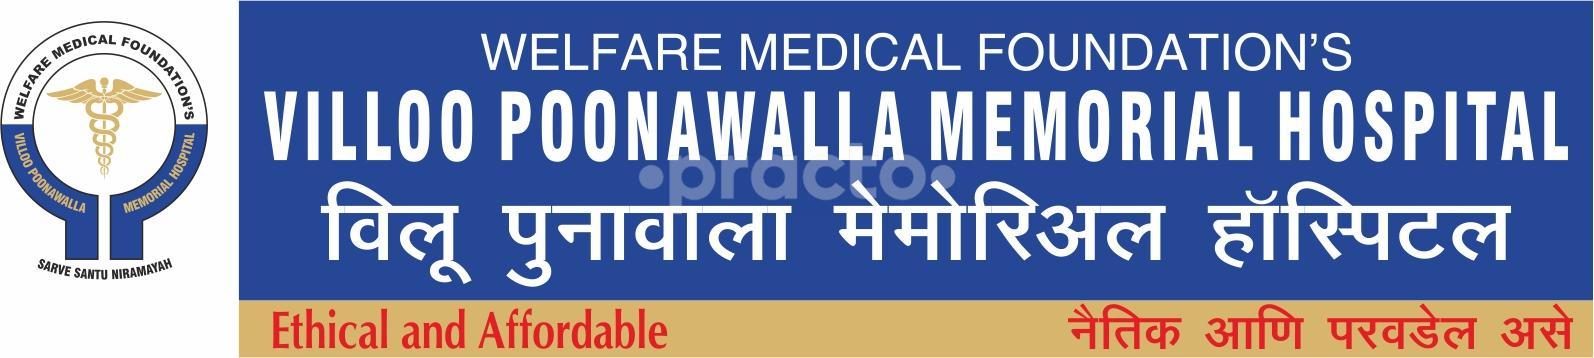 Villoo Poonawalla Memorial Hospital